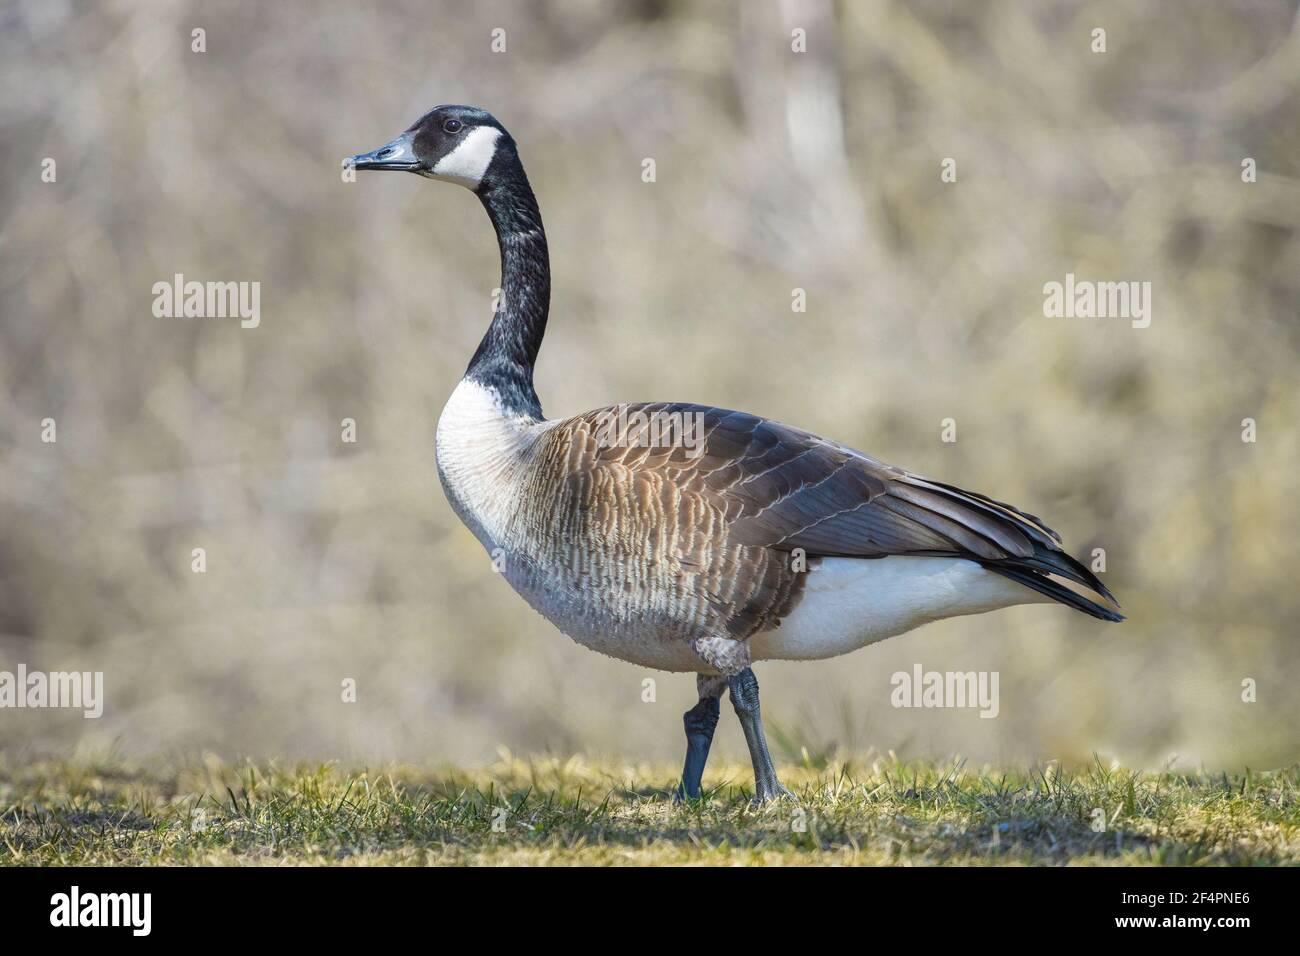 portrait-of-a-canada-goose-2F4PNE6.jpg